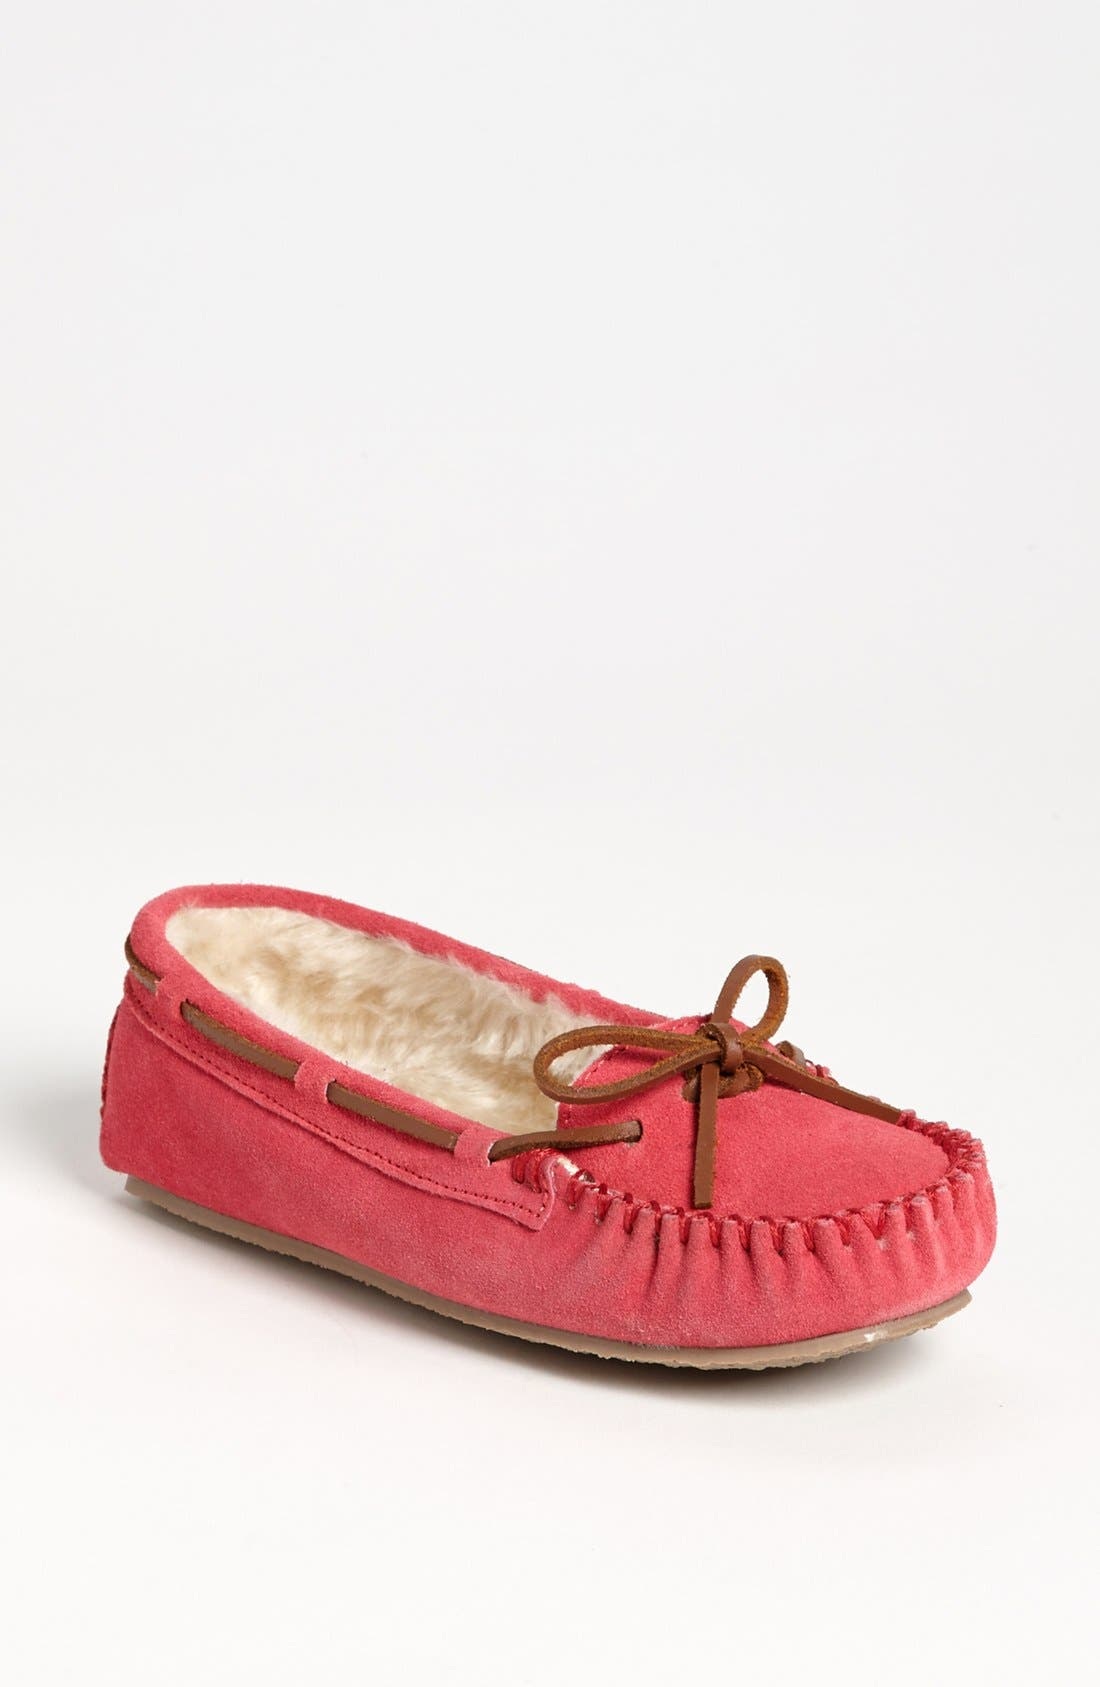 Minnetonka 'Cally' Slipper